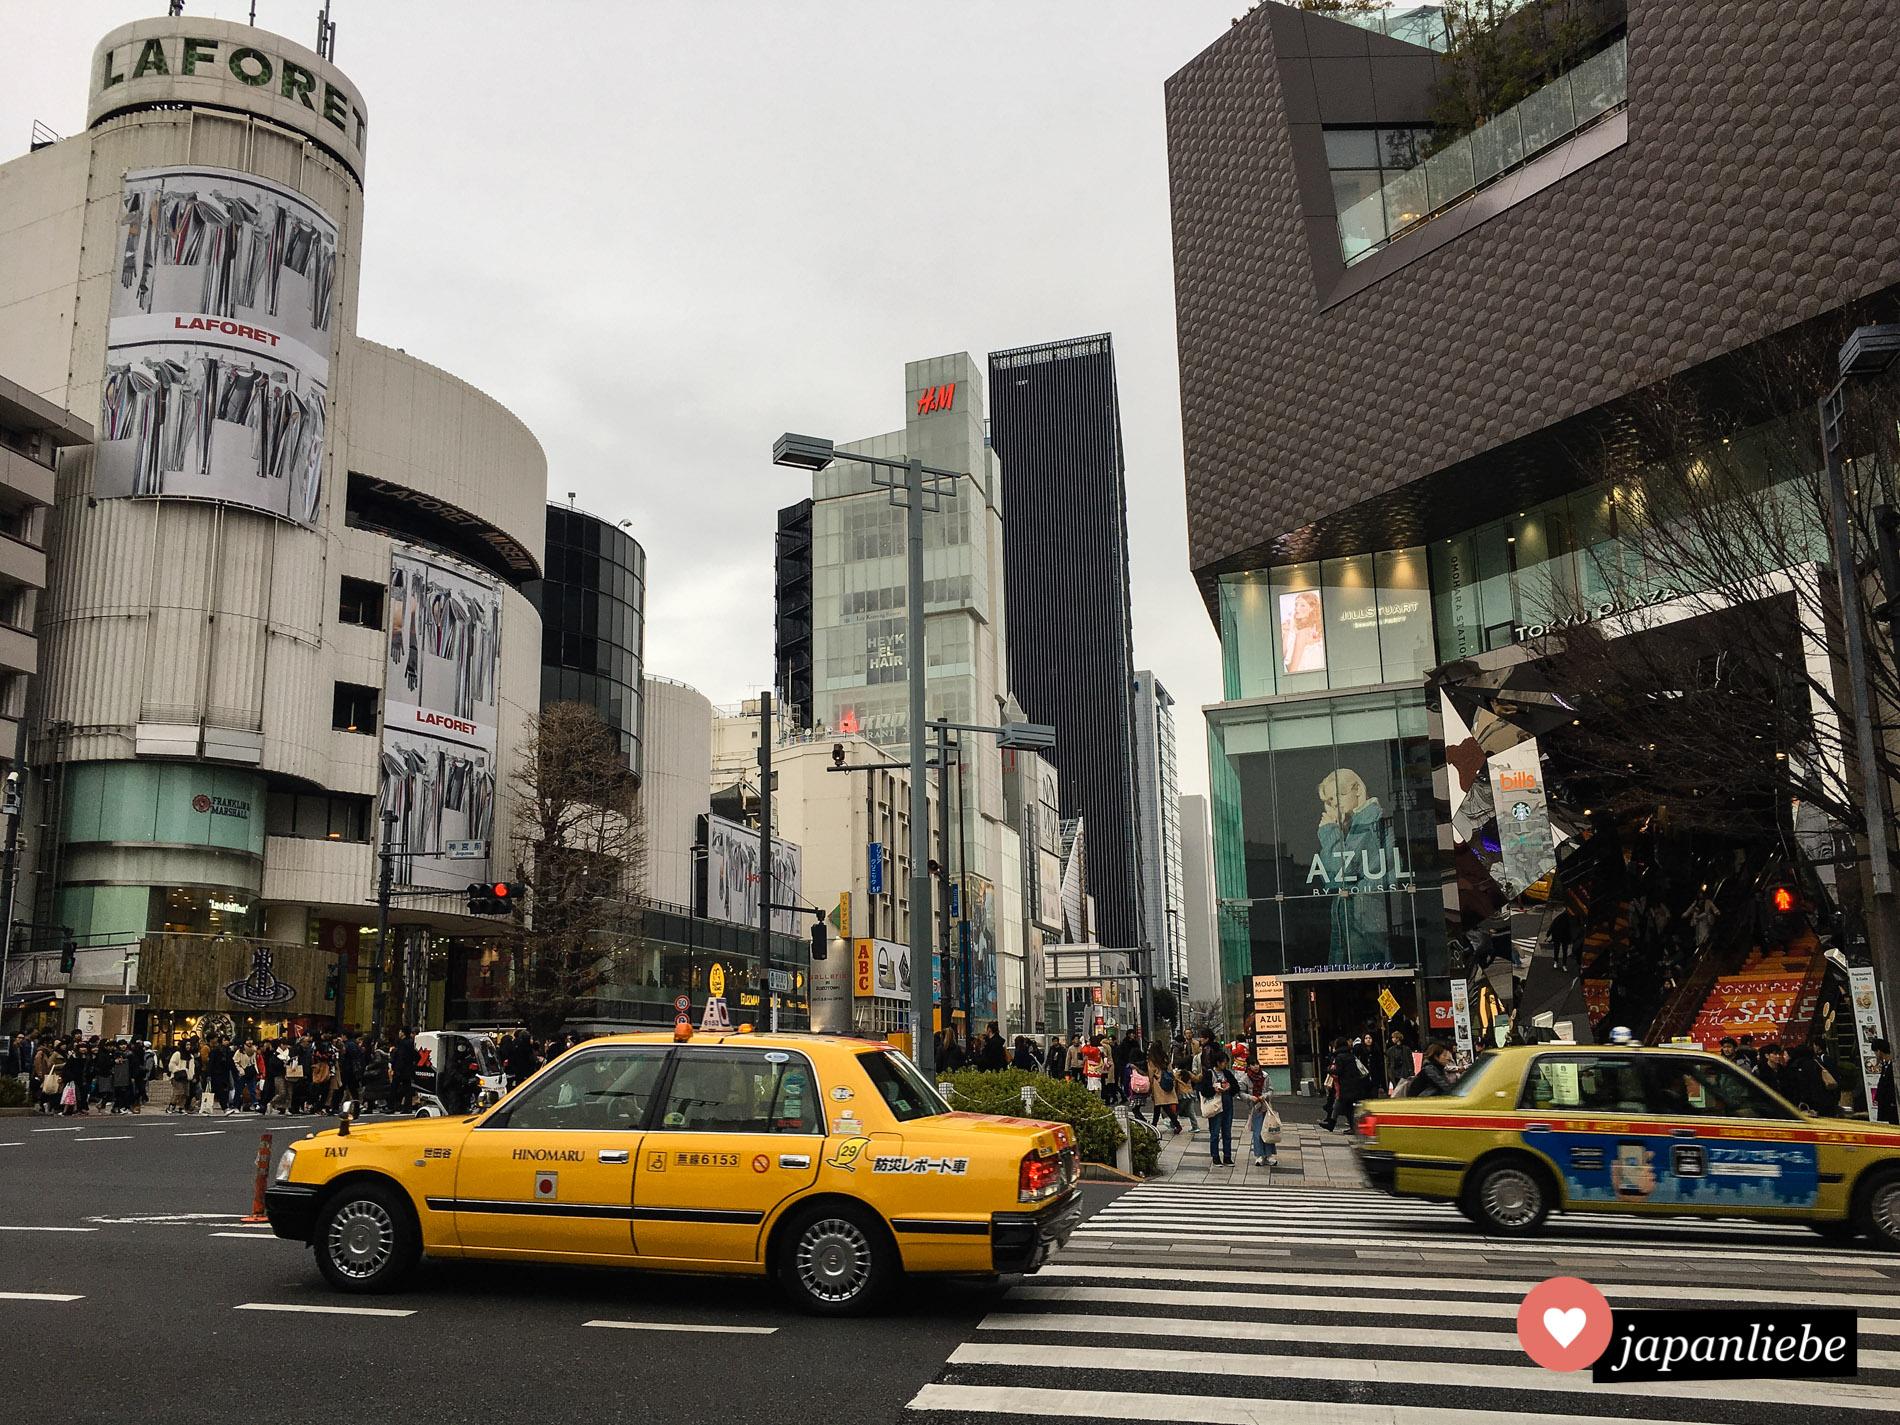 Hotspot für Shoppen in Tōkyō: die Omotesandō.